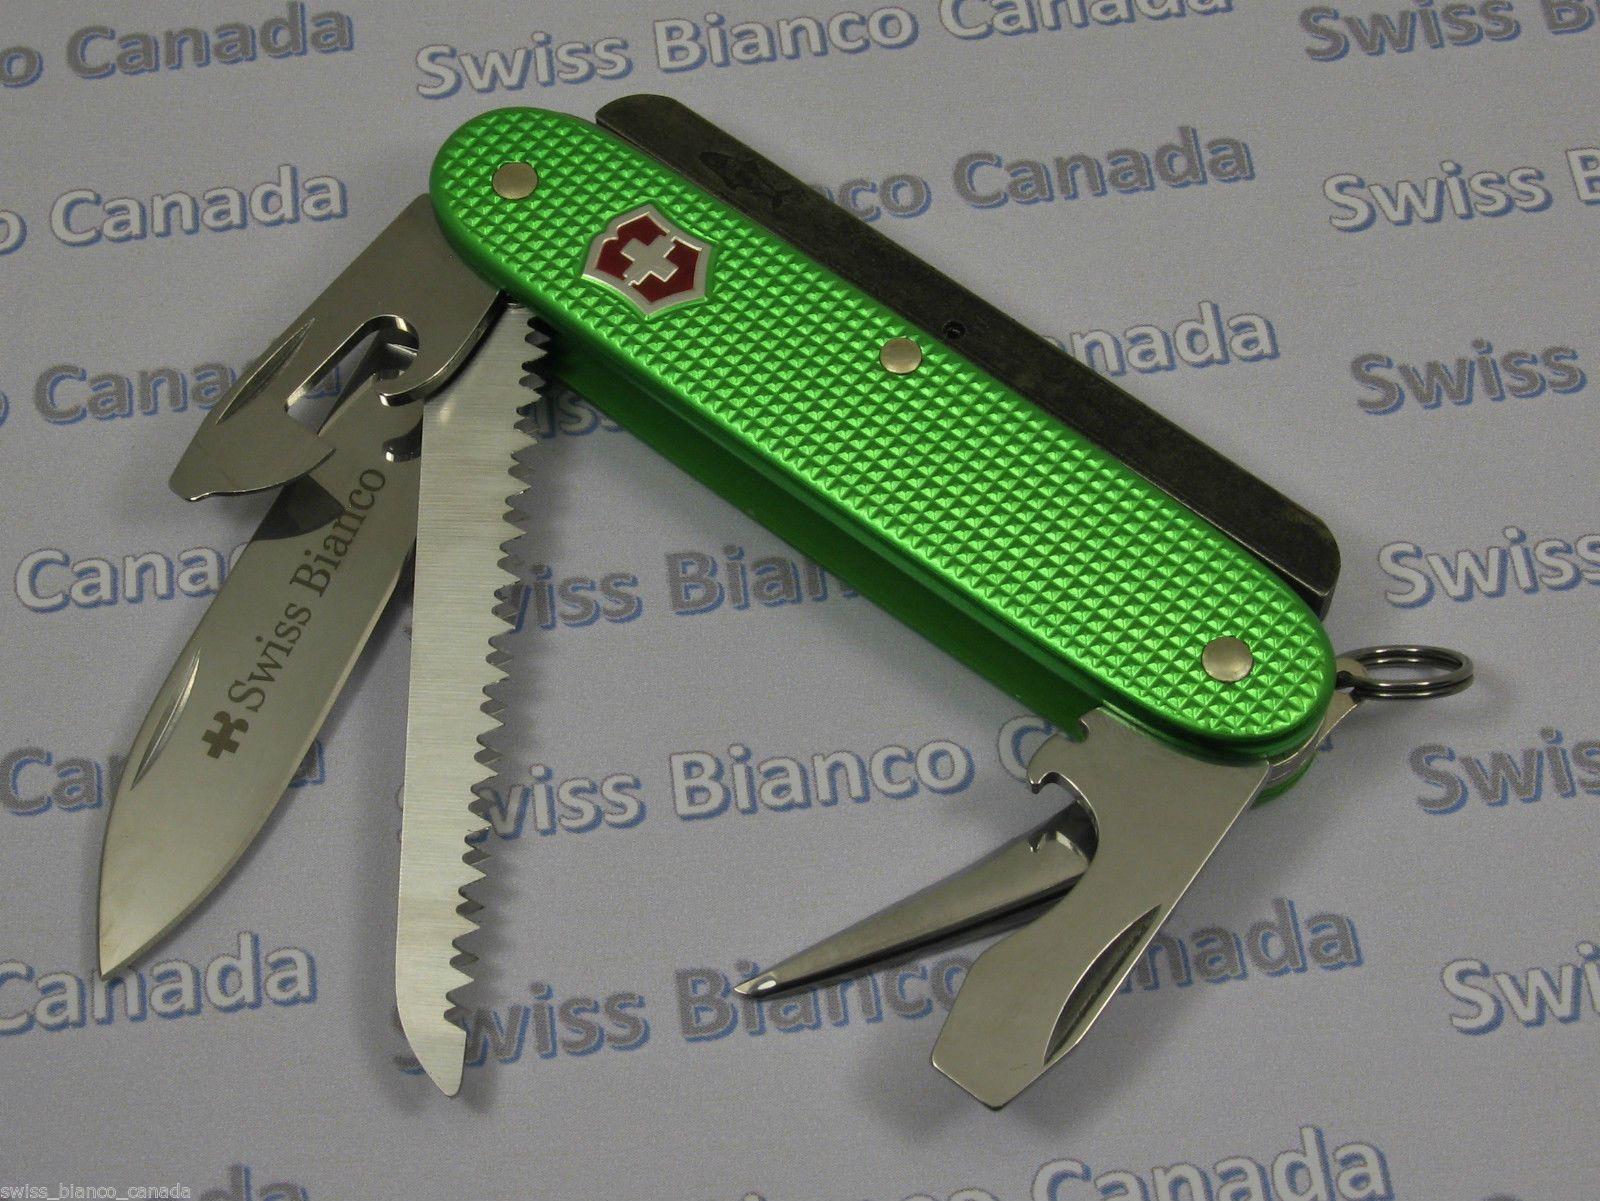 Swiss Bianco Exclusive Firesteel Victorinox Farmer Green